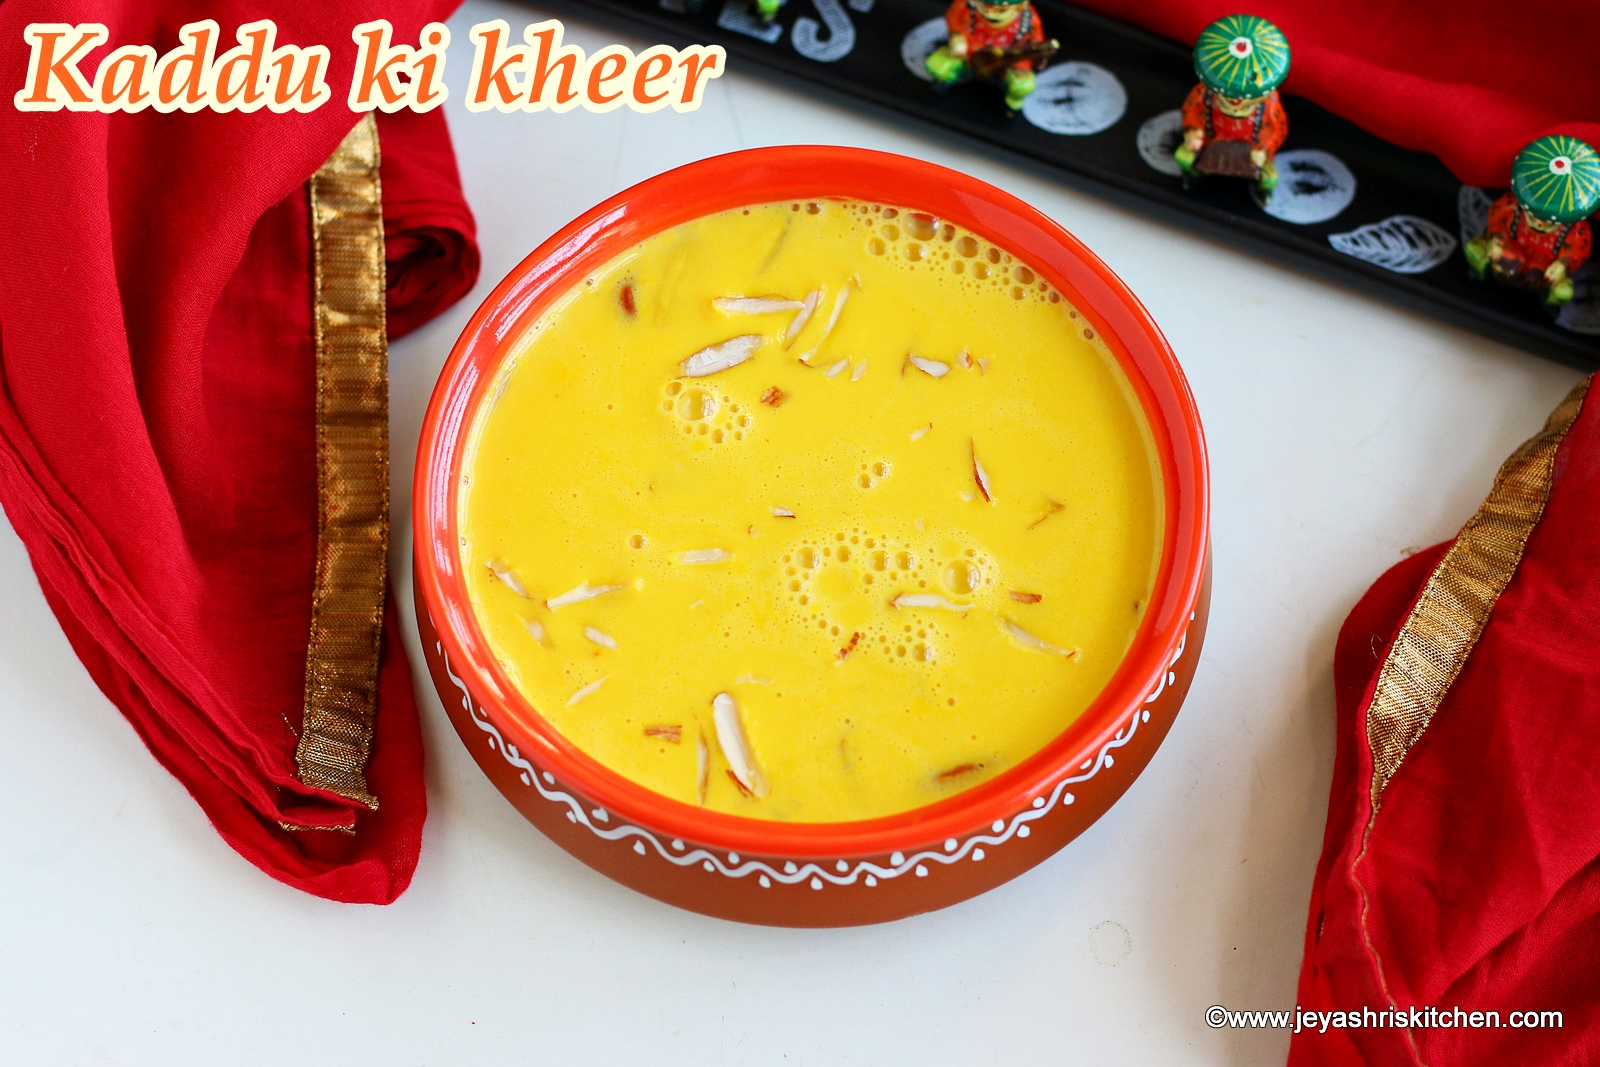 kaddu ki kheer recipe pumpkin payasam - Jeyashris Kitchen